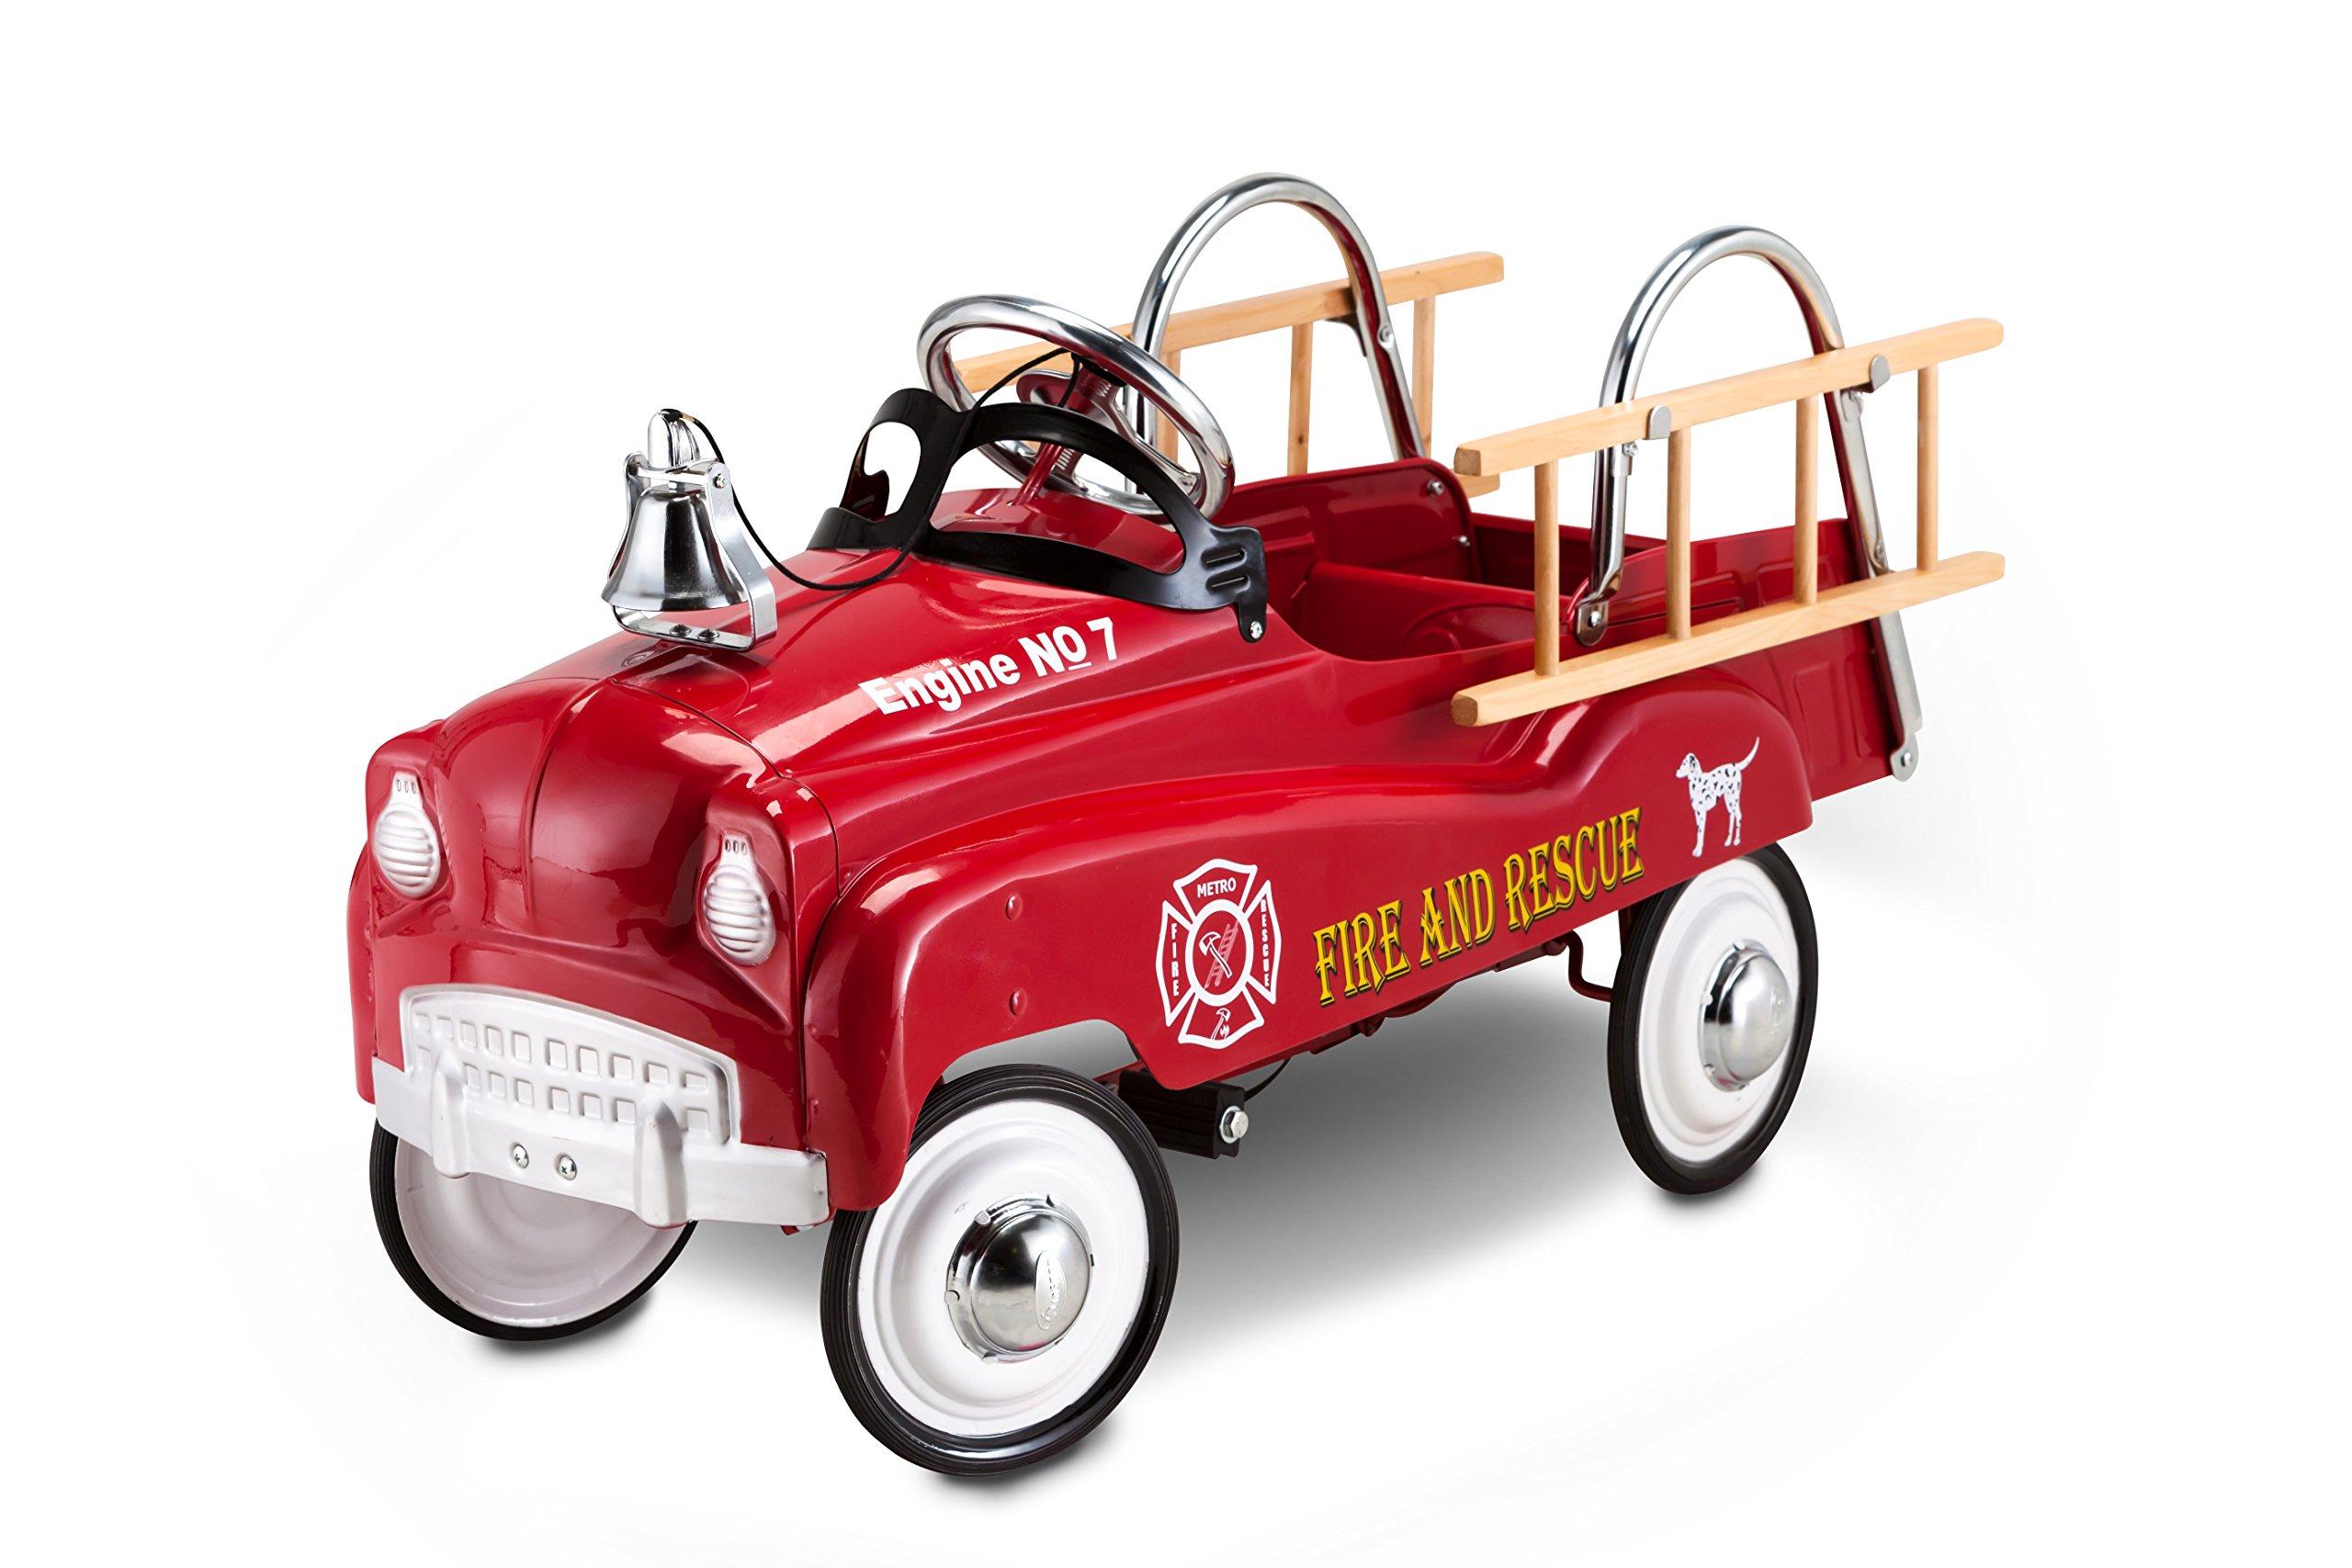 Fire Truck Pedal Car: InStep Fire Truck Pedal Car